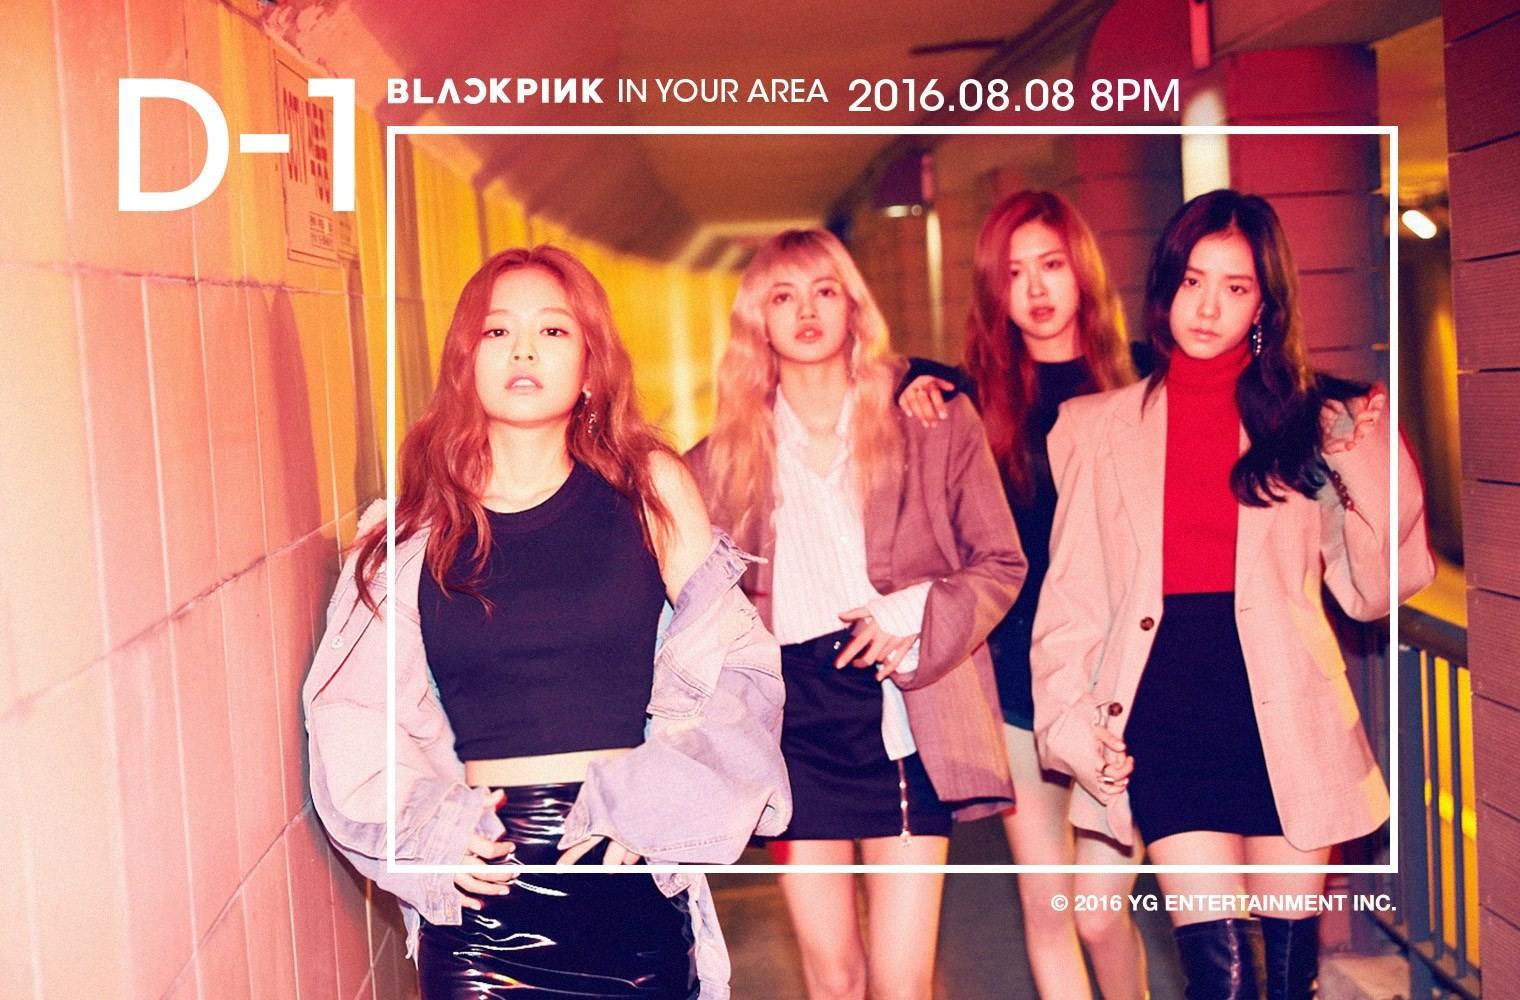 #24. BLACKPINK BLACK PINK帶有稍微否定粉紅色是最美的顏色的涵義,具有『漂亮並不代表全部』的反轉意義,也表示成員們不僅具備外貌、同時也兼具實力。